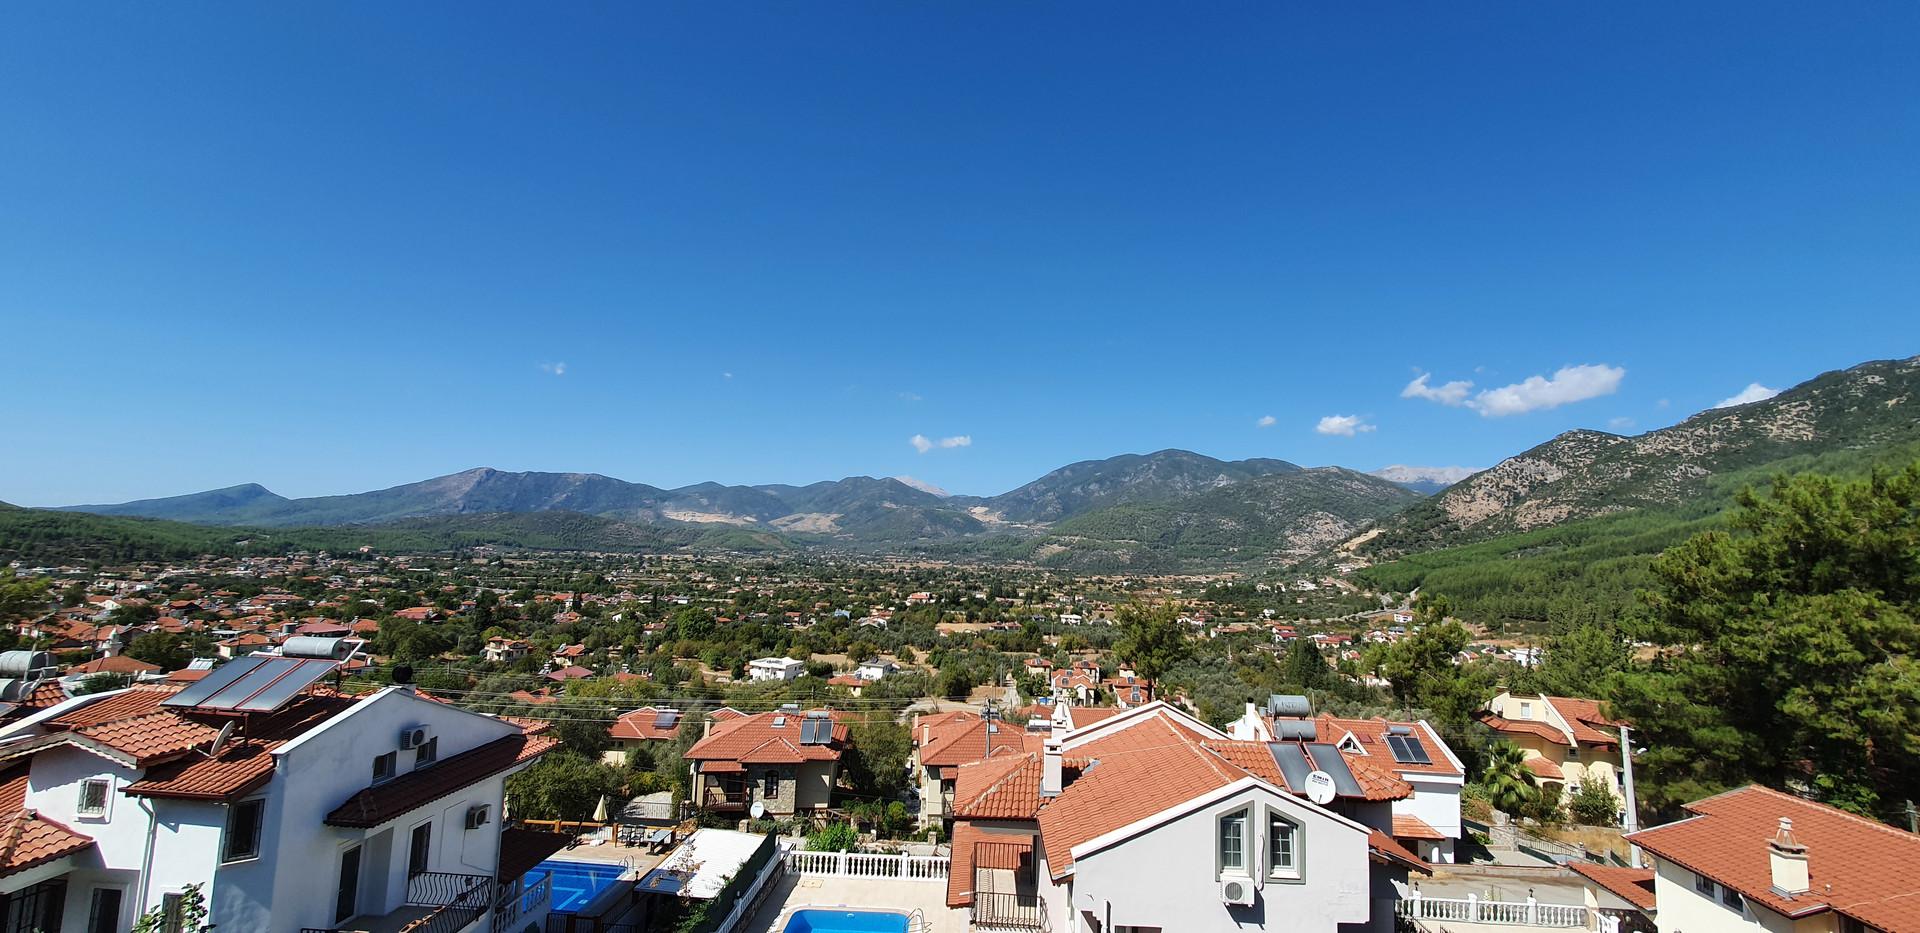 Roof terrace balcony view